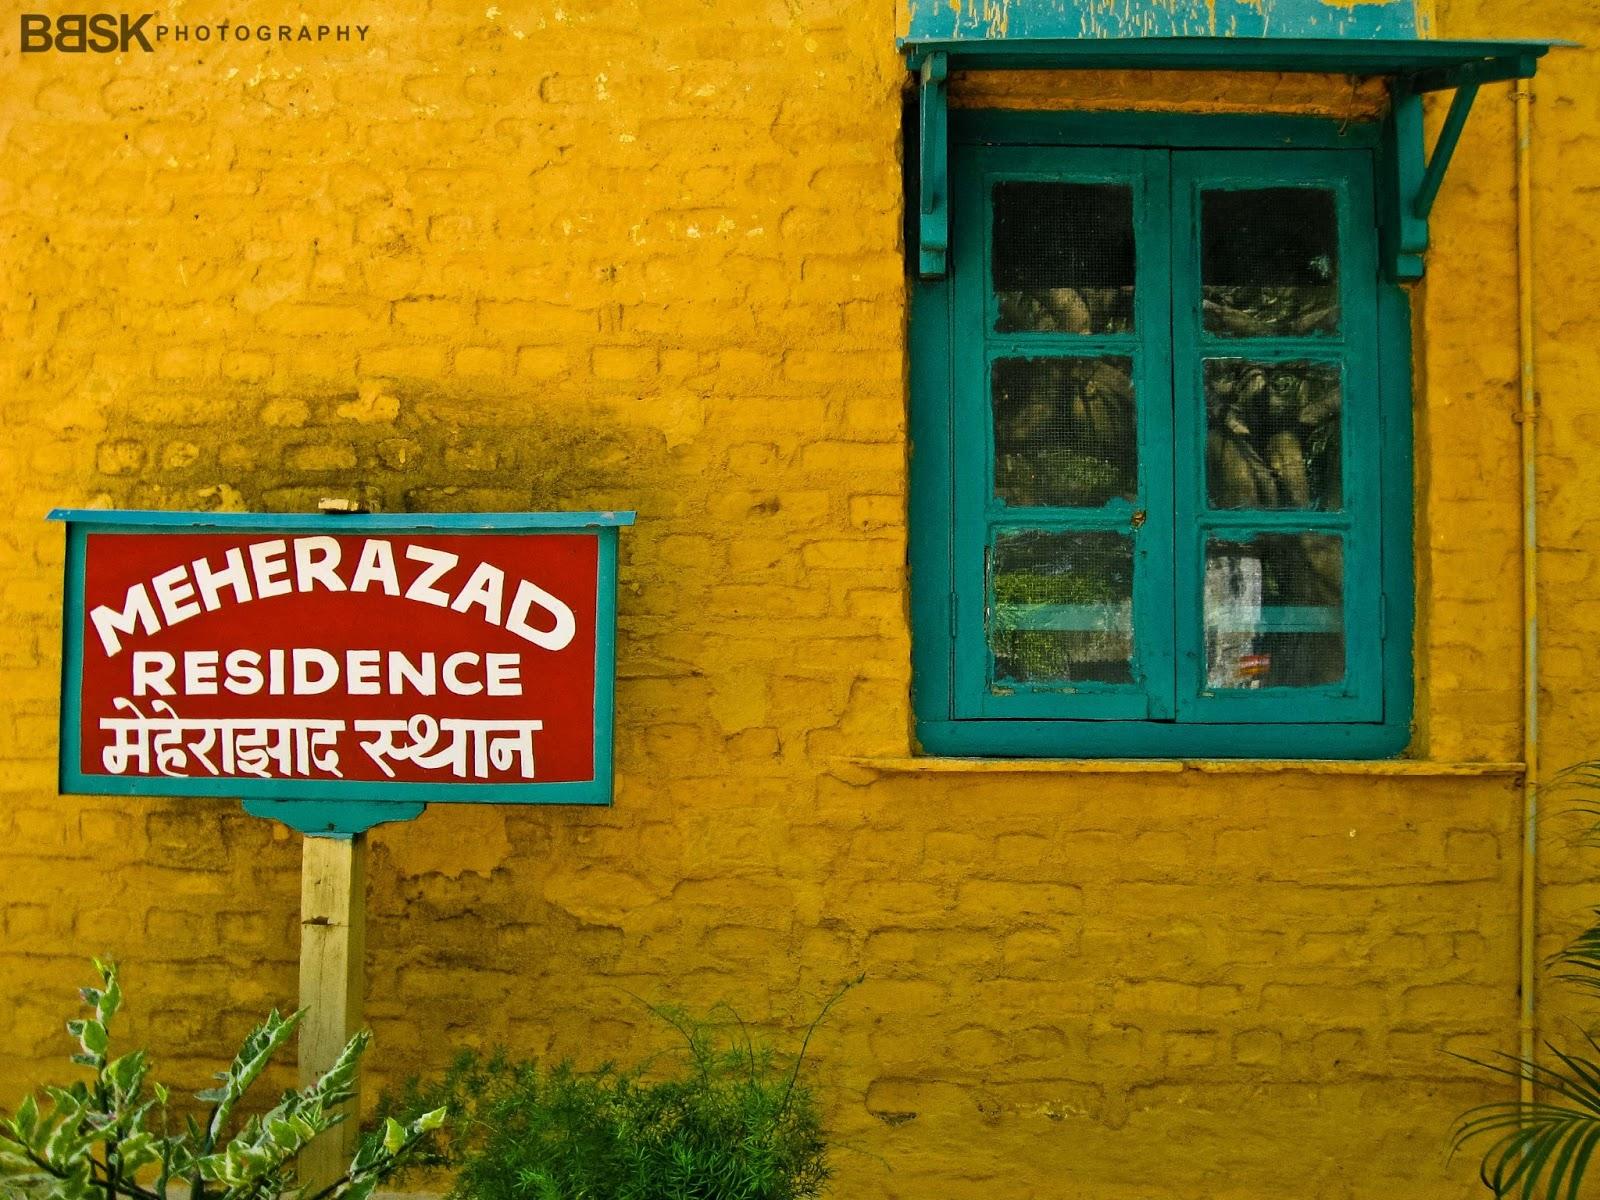 meherazad